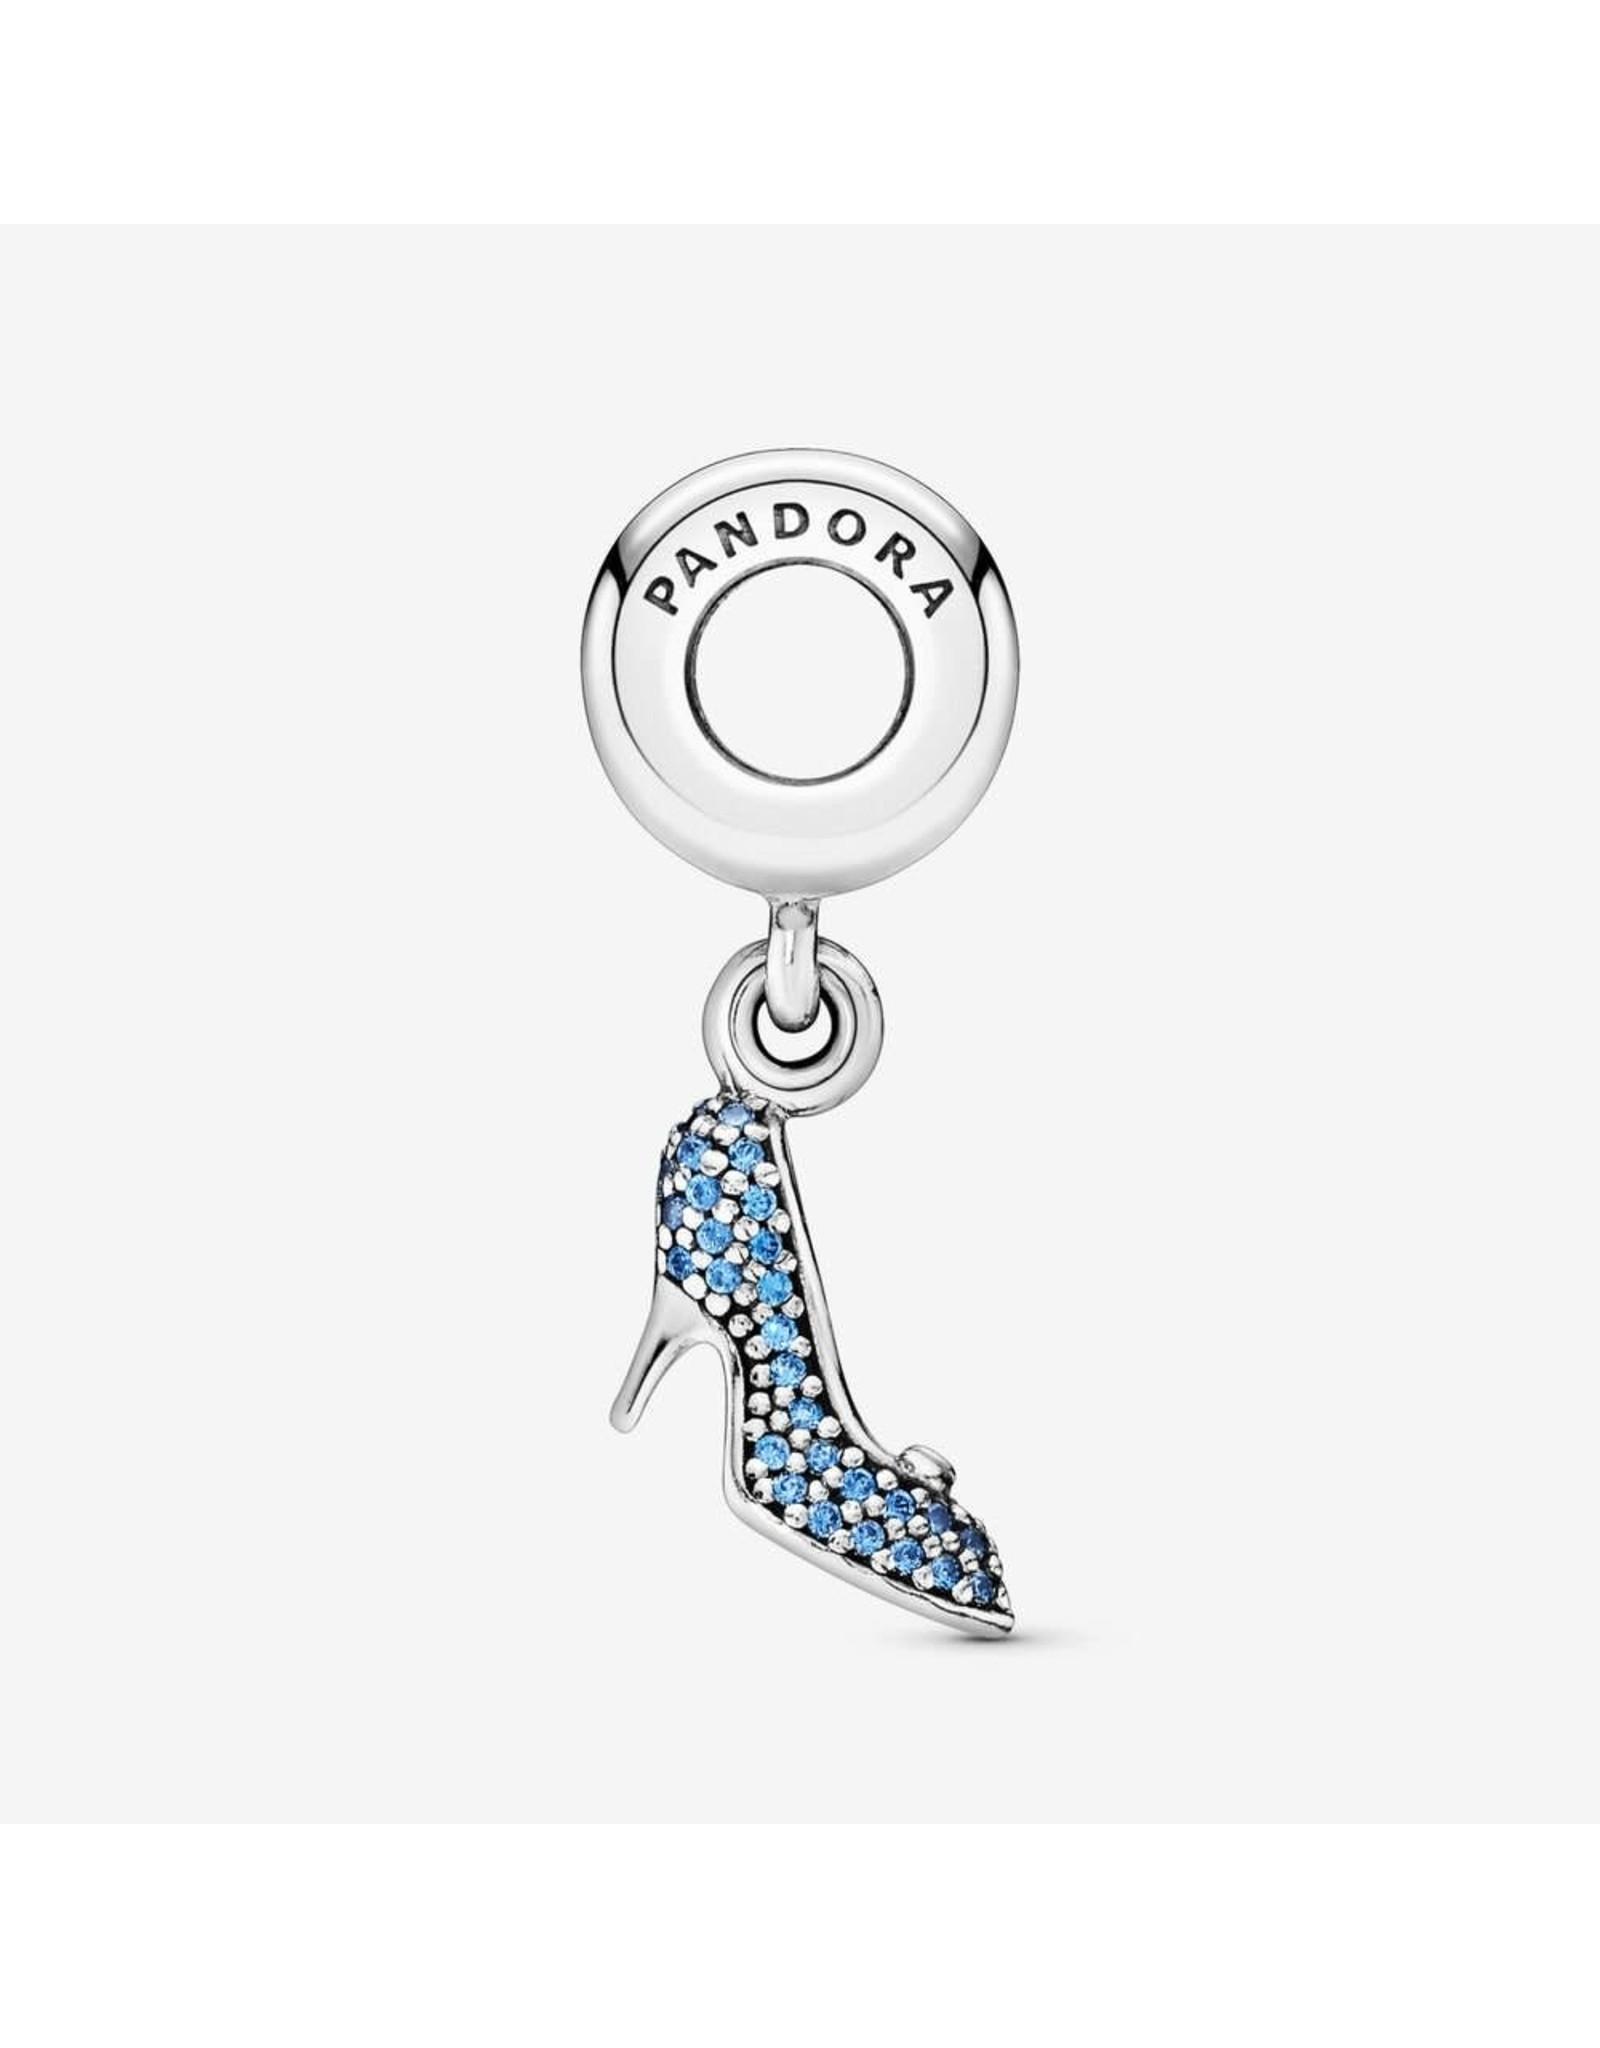 Pandora Pandora Charm, Disney, Cinderella Sparkling Slipper